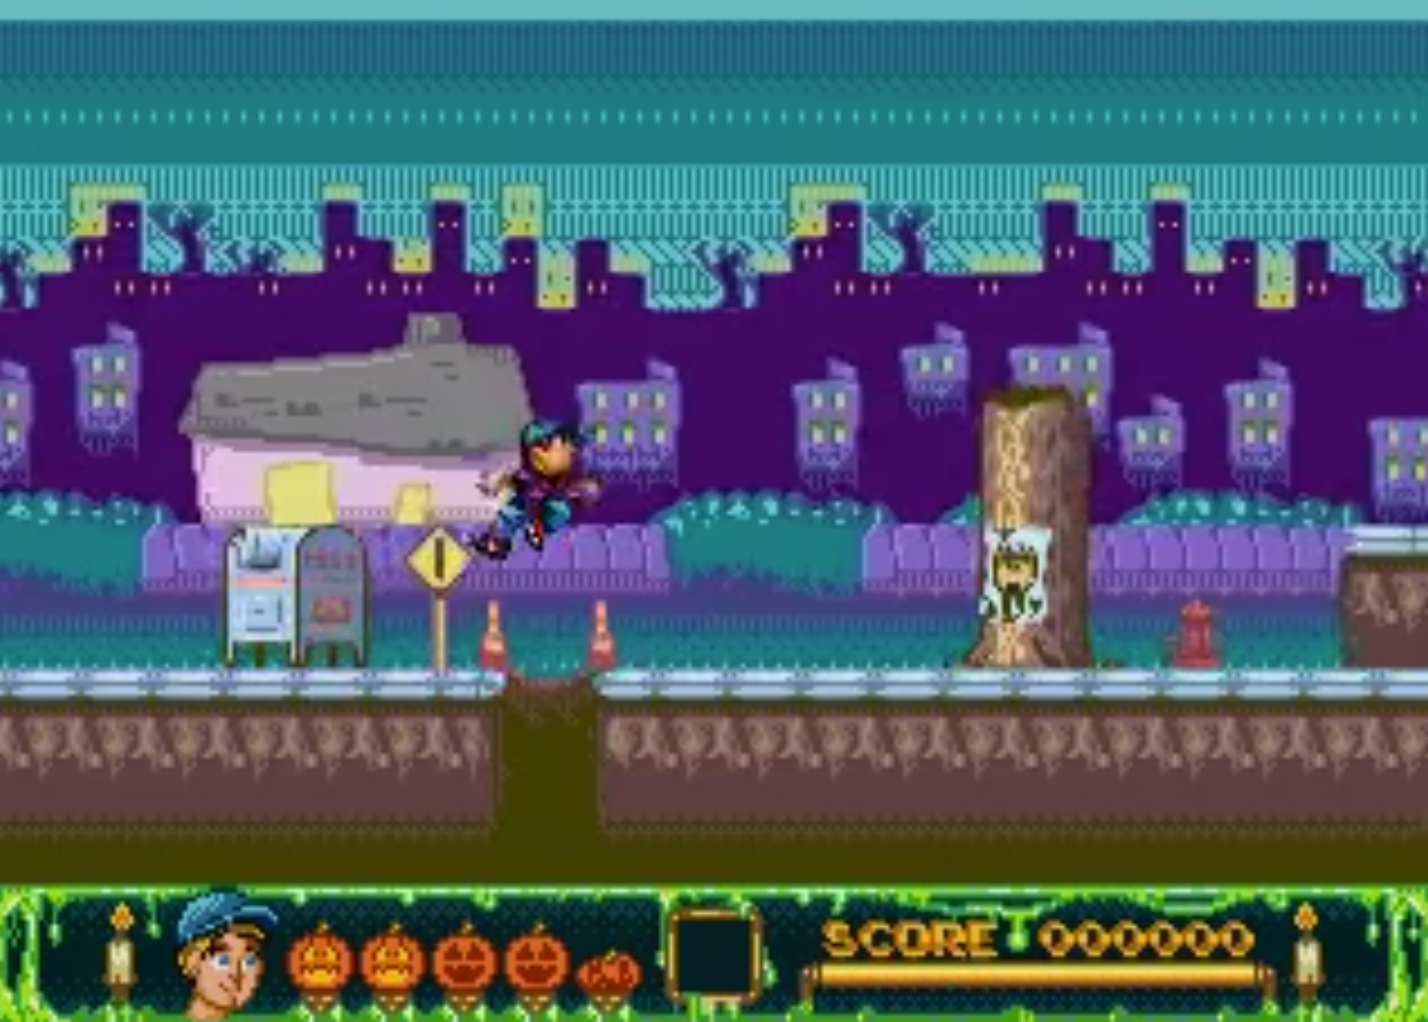 Project: Halloween announced for the Sega Genesis / Mega Drive